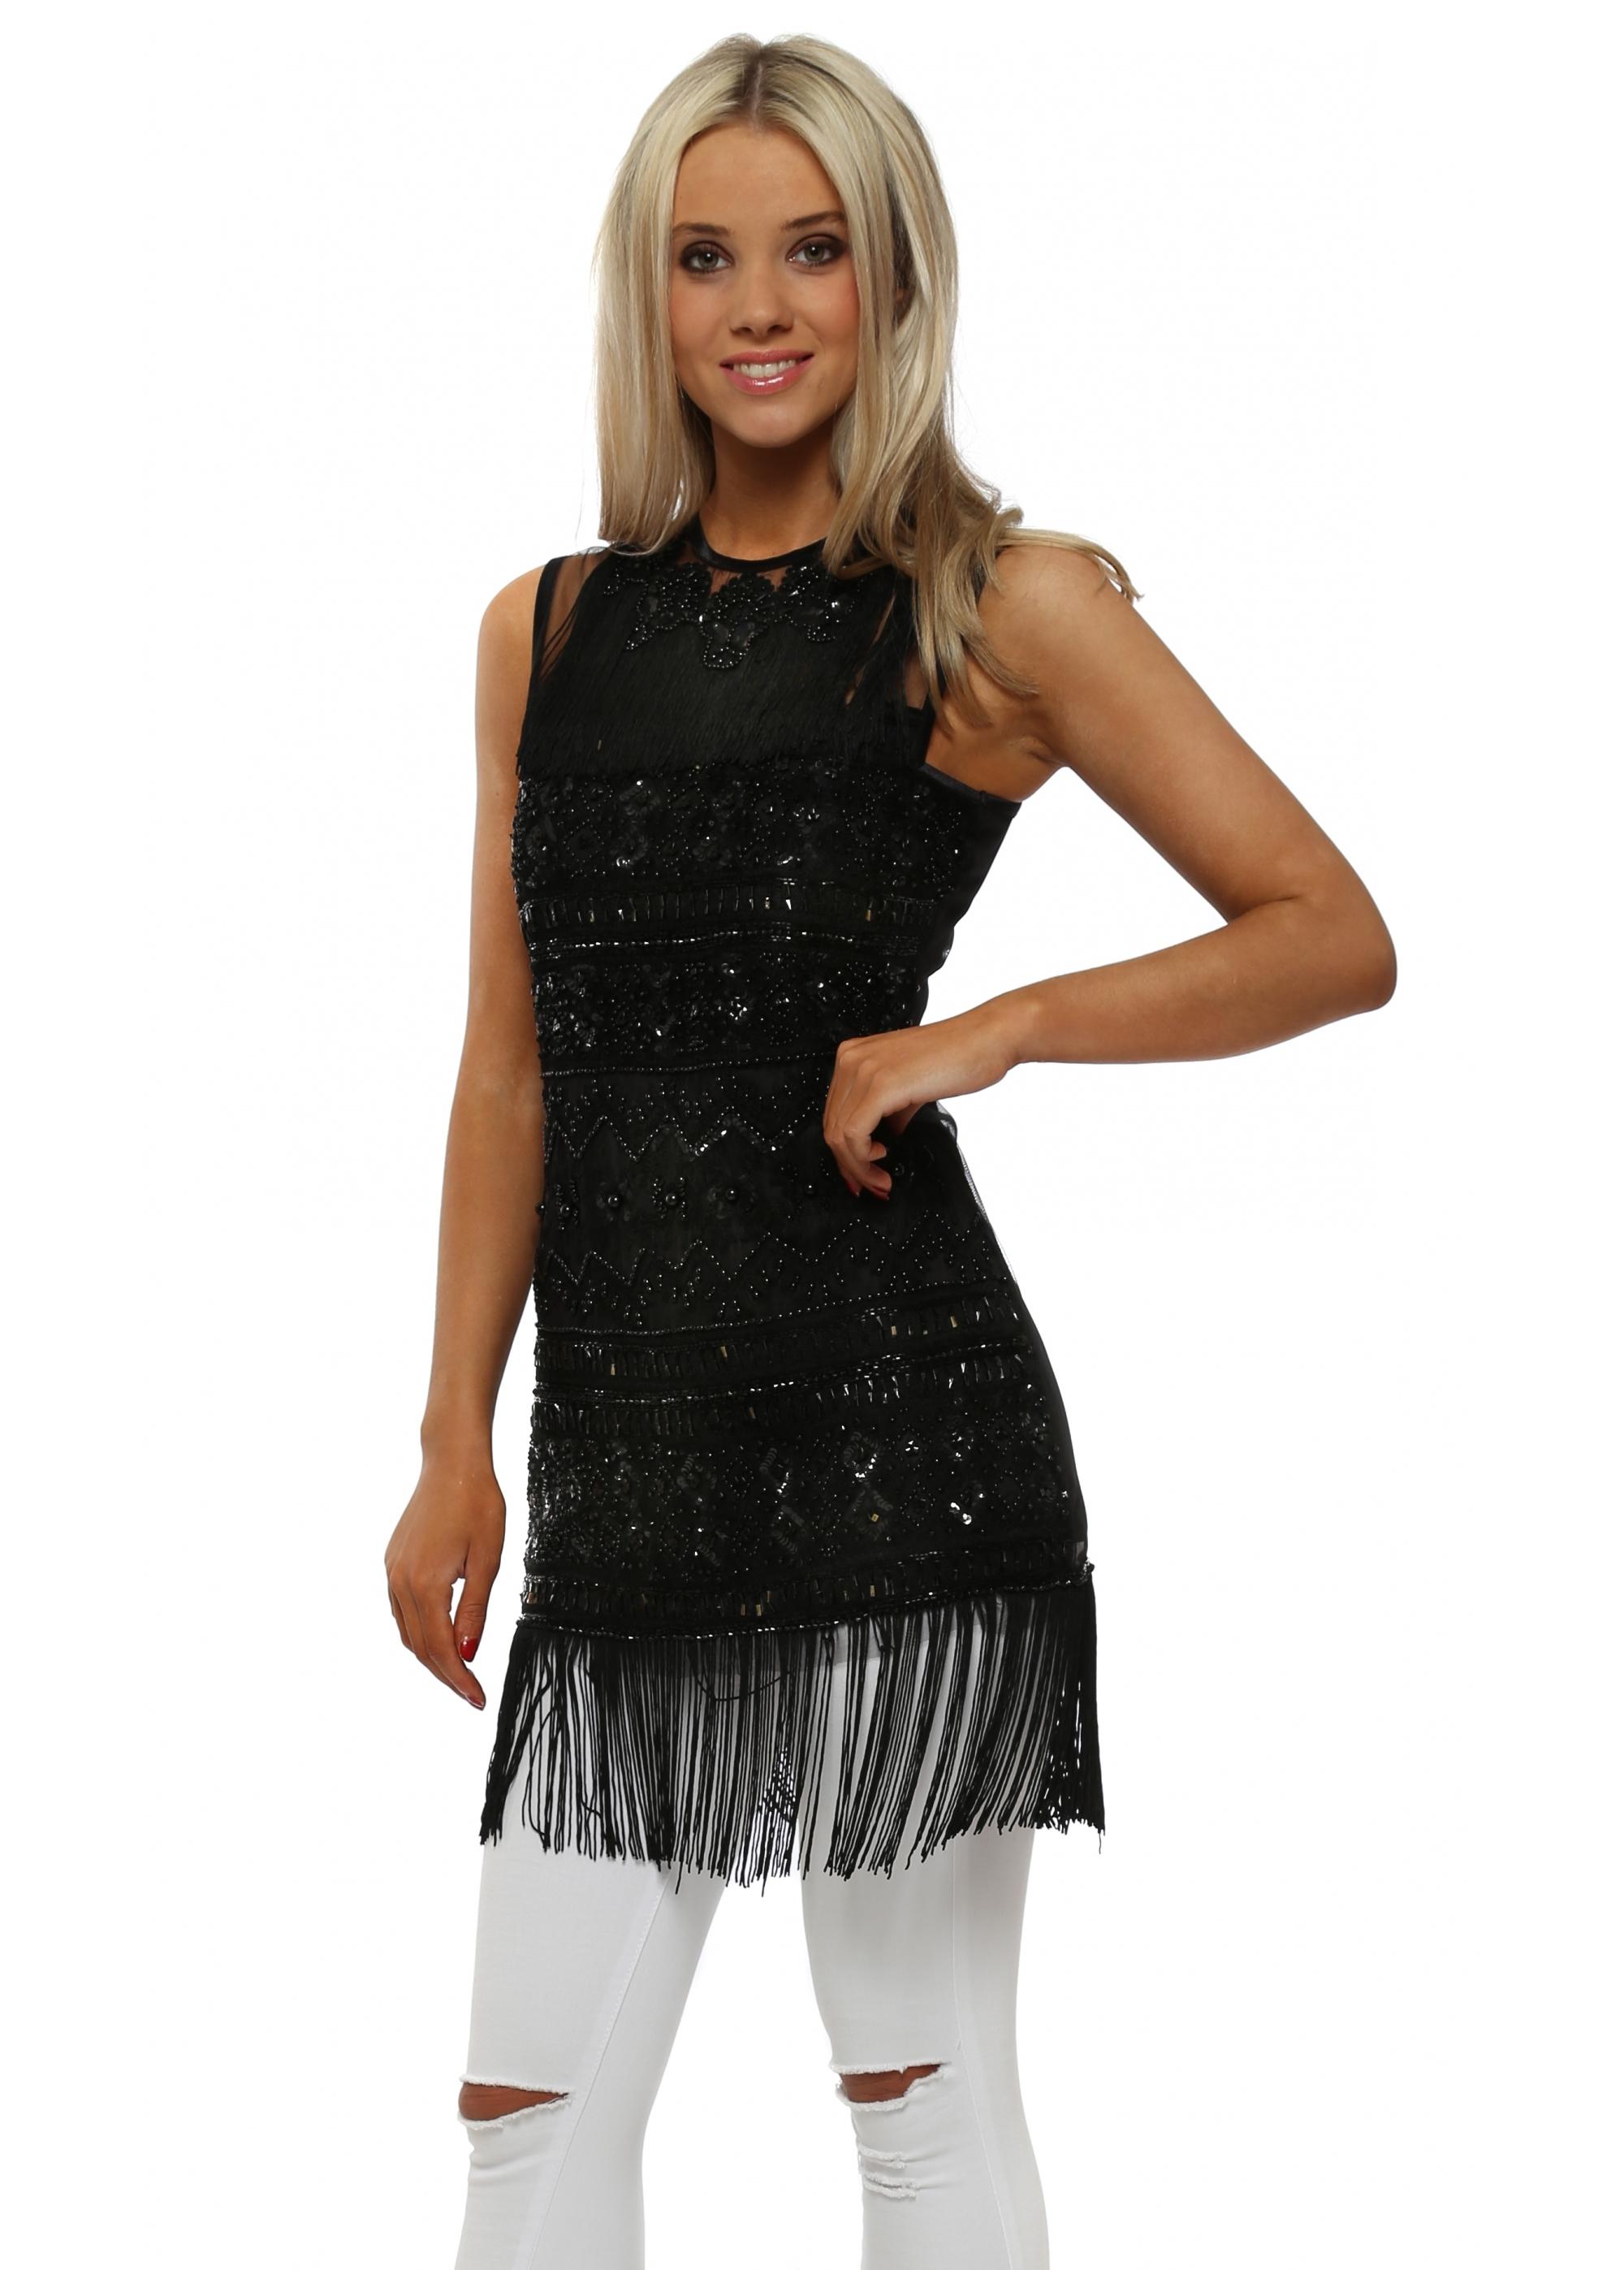 f6fe5284ccbf35 Starry Eyed Top - Black Sequin Tassel Top